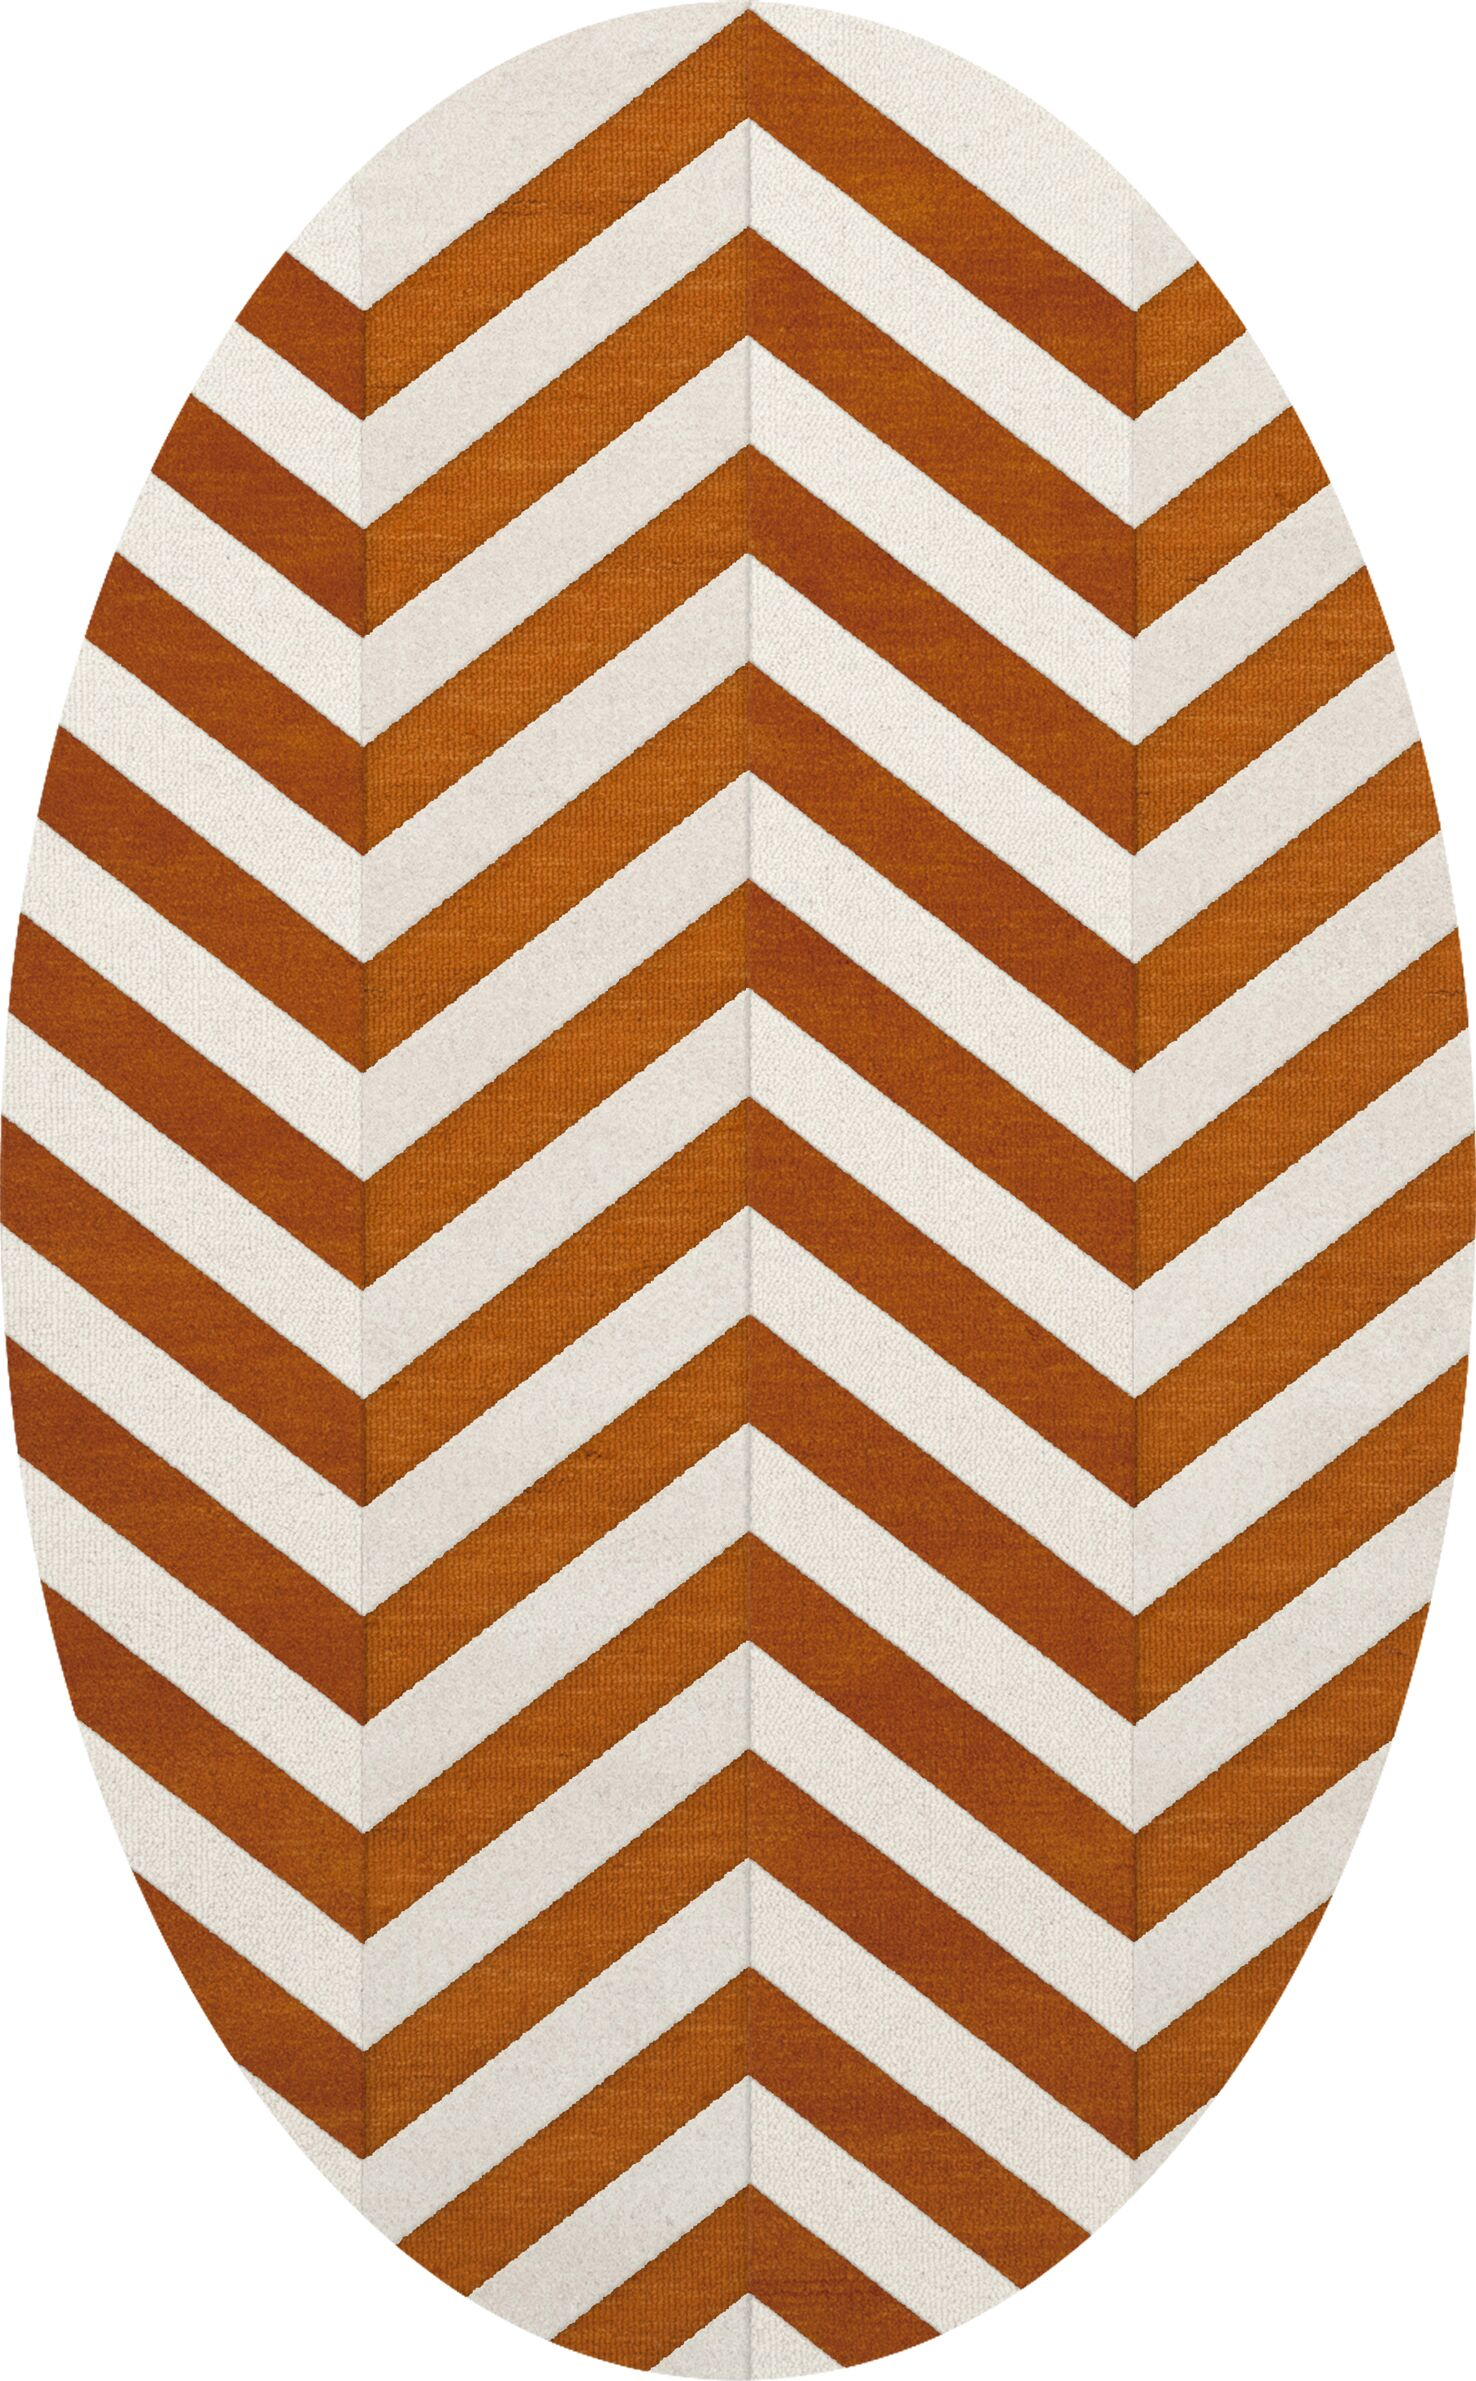 Shepler Wool Tangerine Area Rug Rug Size: Oval 3' x 5'